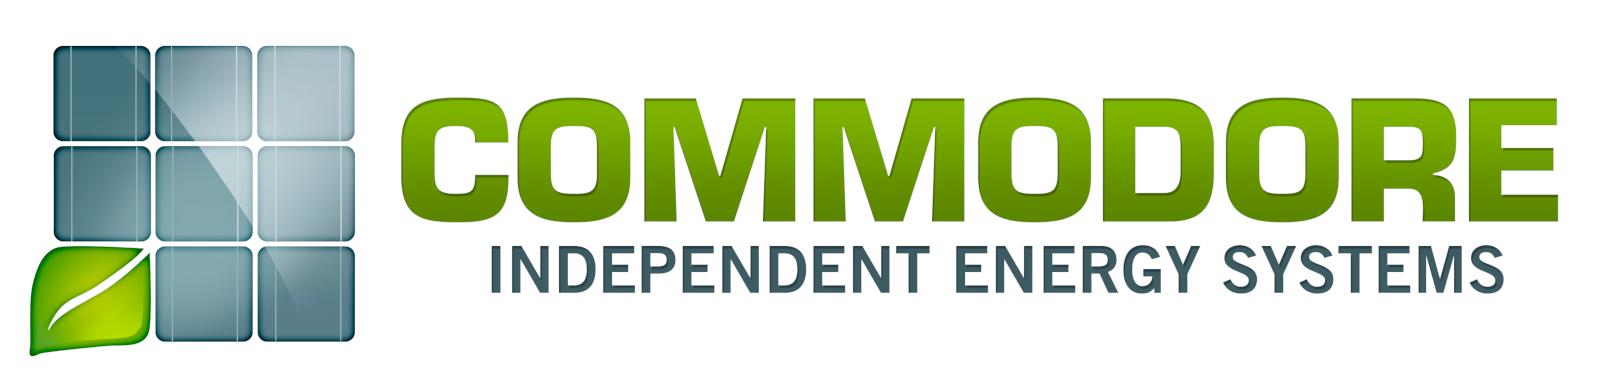 logoCommodore